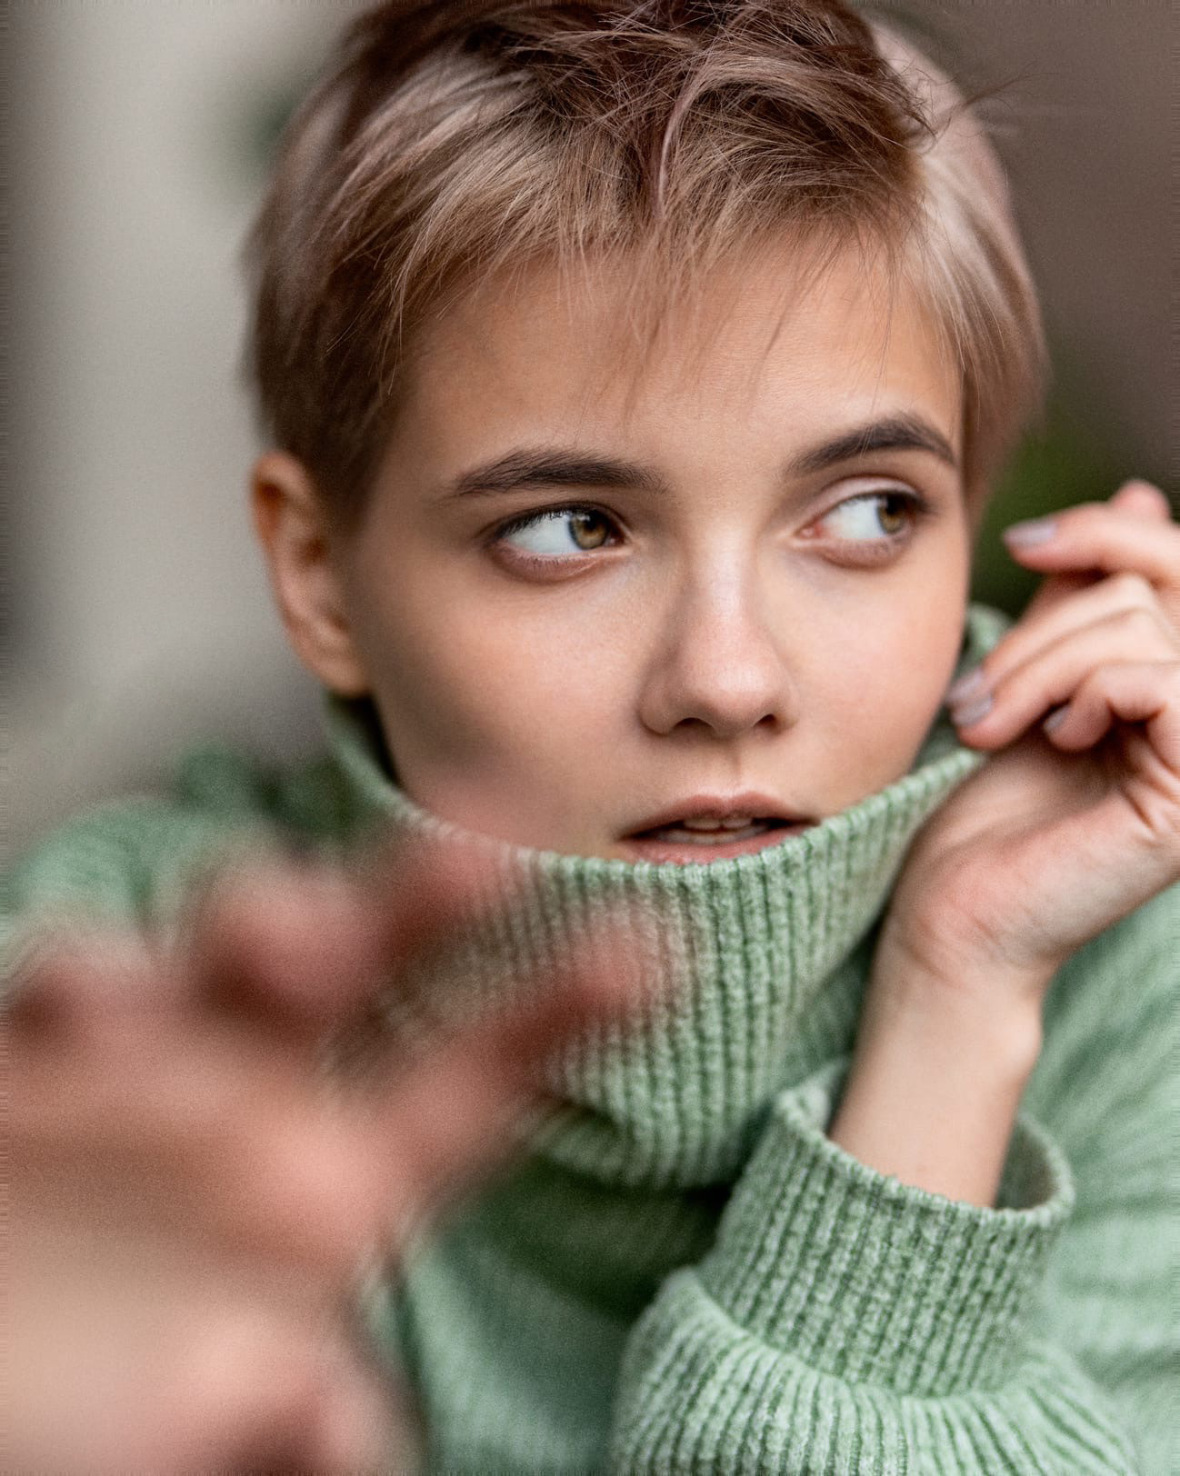 Victoria Sokolova - Ilya Pistoletov / Виктория Соколова - Илья Пистолетов